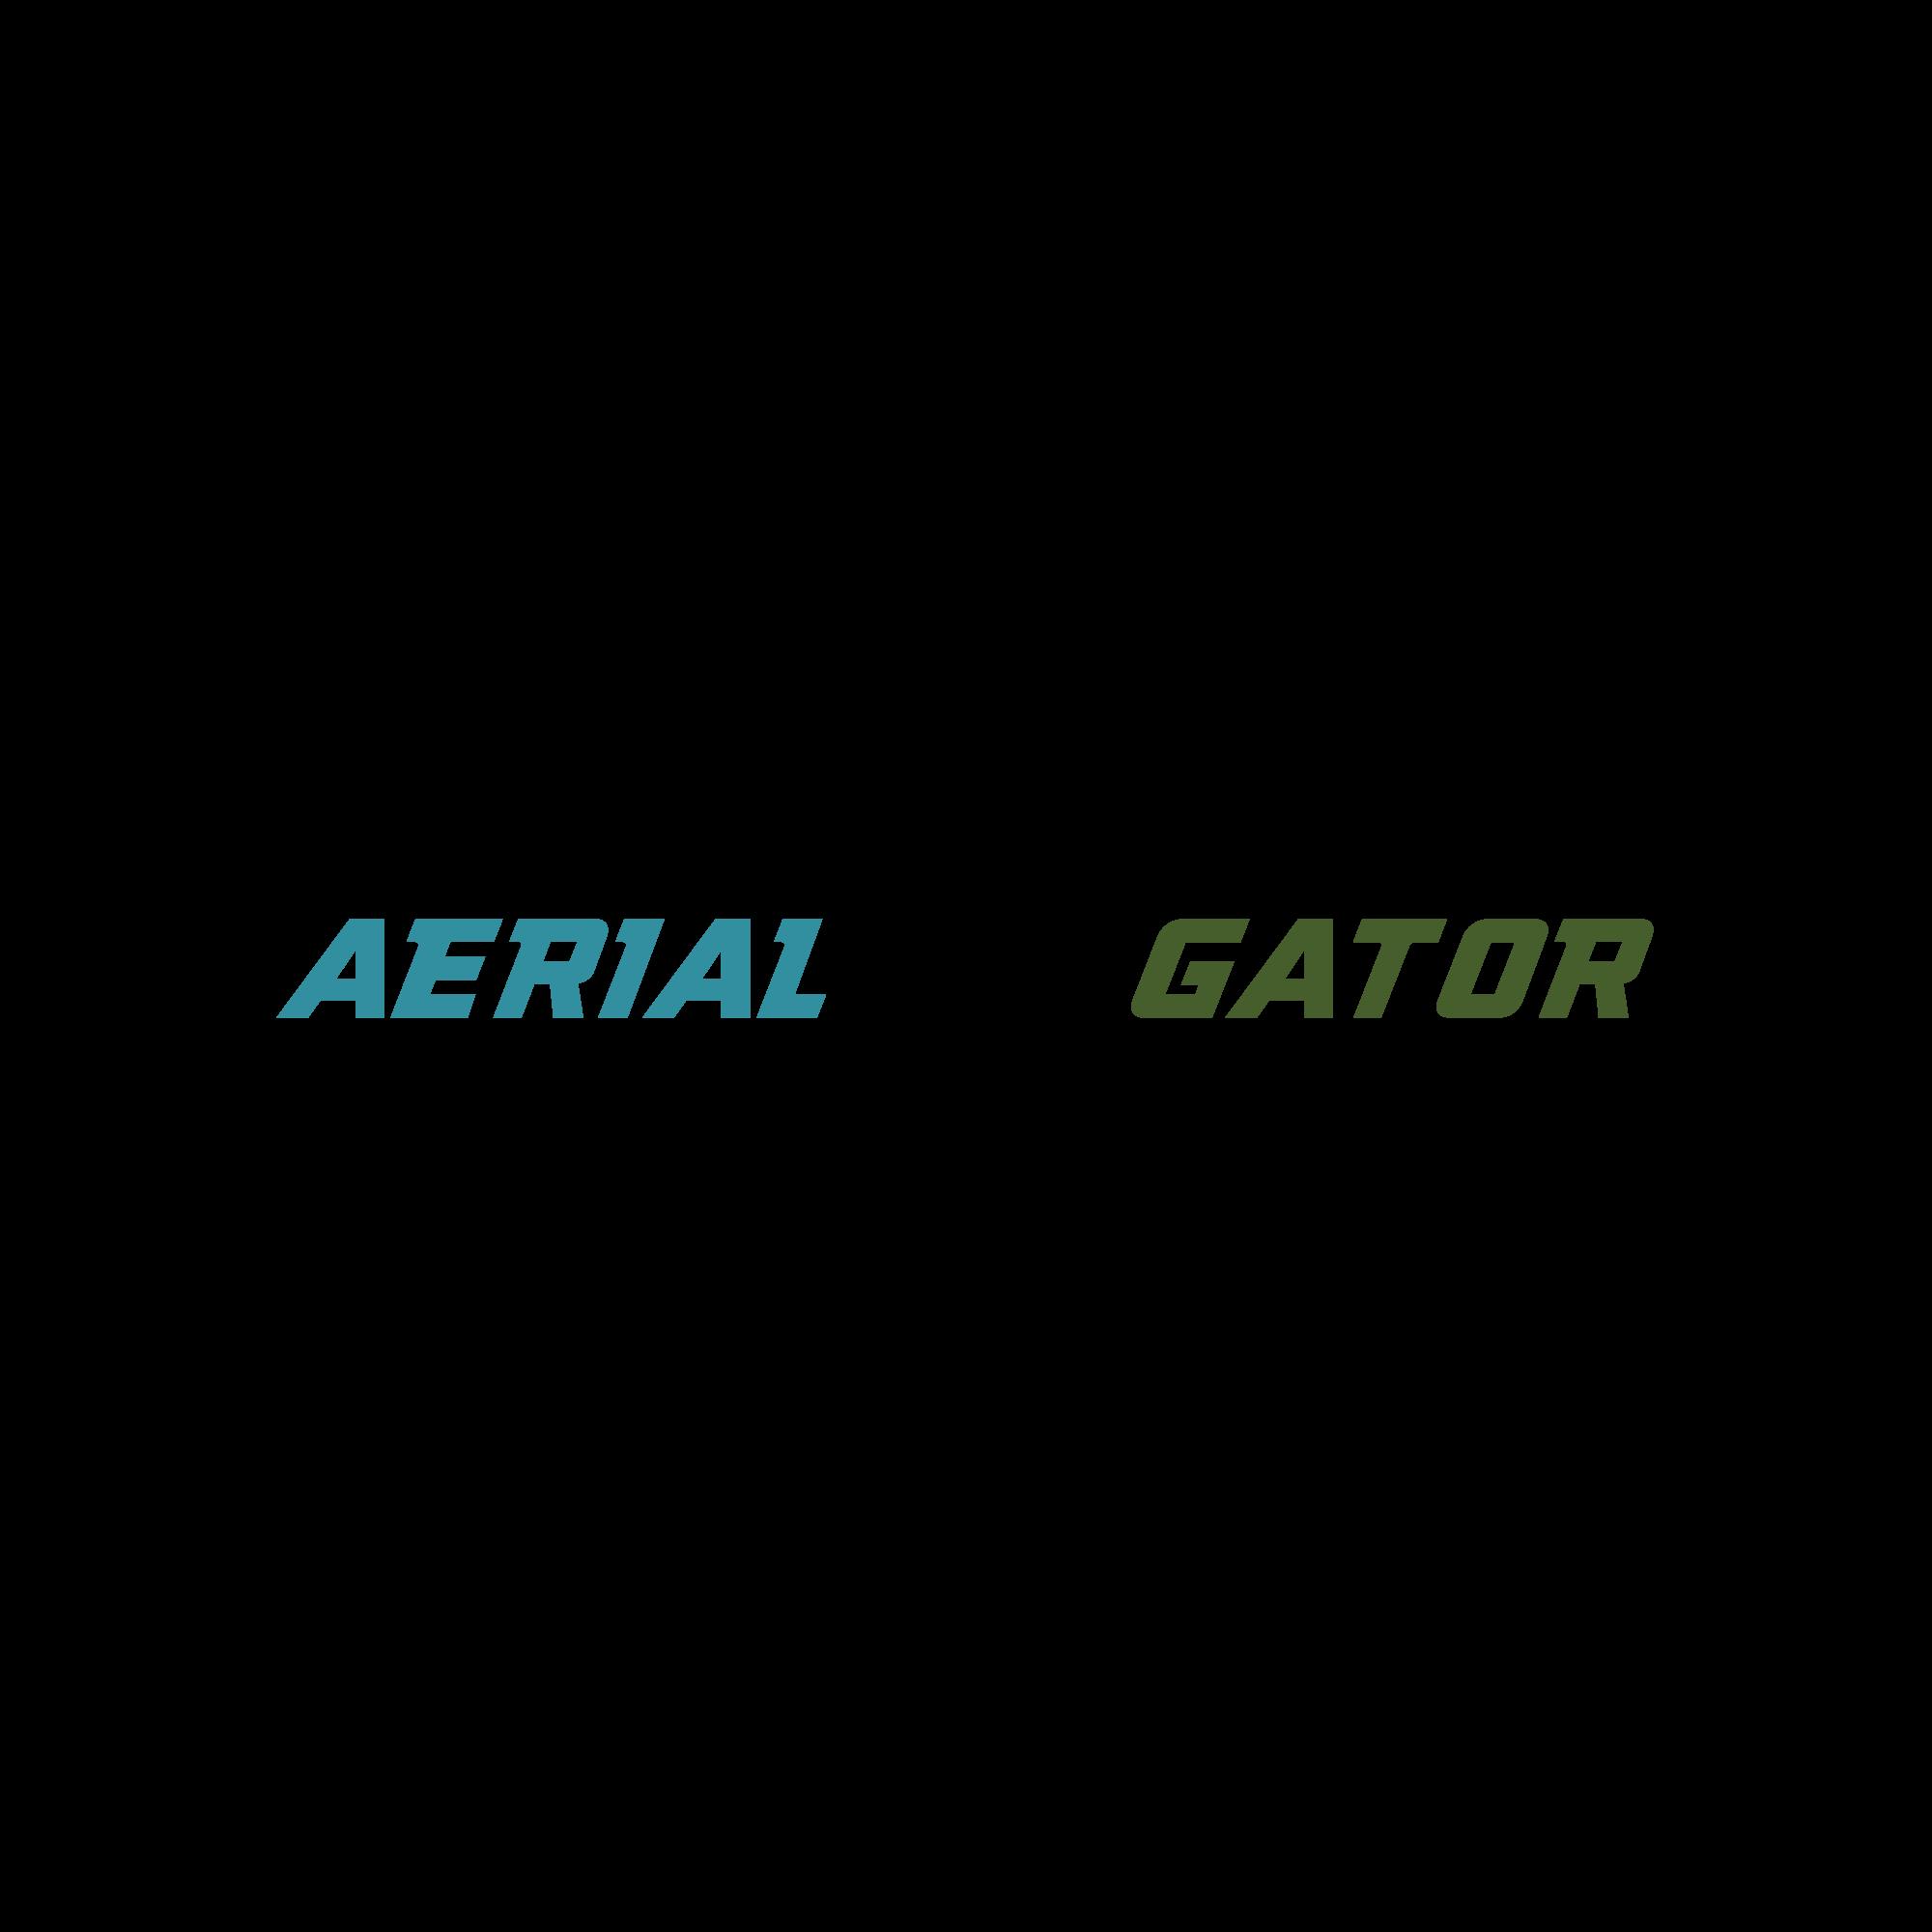 AerialGator Drone Photography needs a minimalist logo design